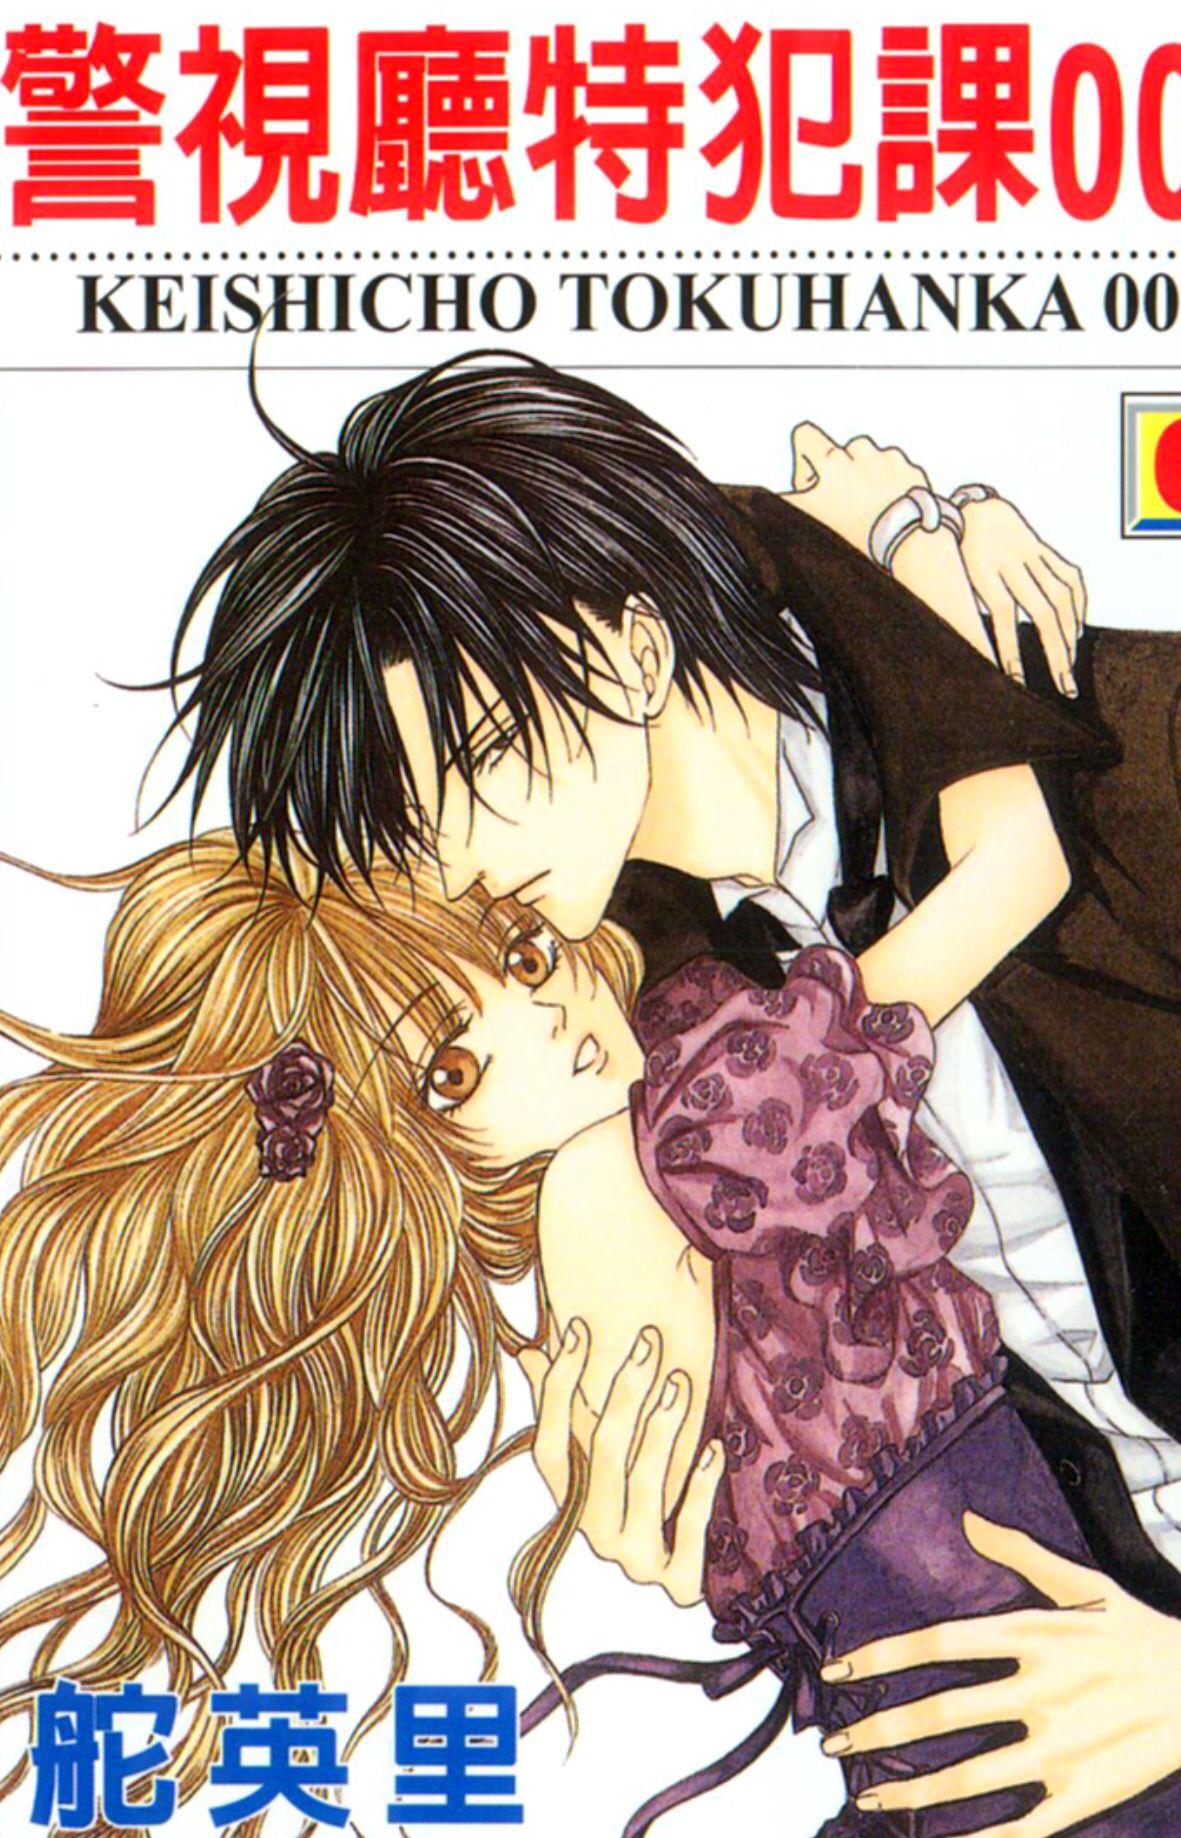 Keishichou Tokuhanka 007 manga Highly to read